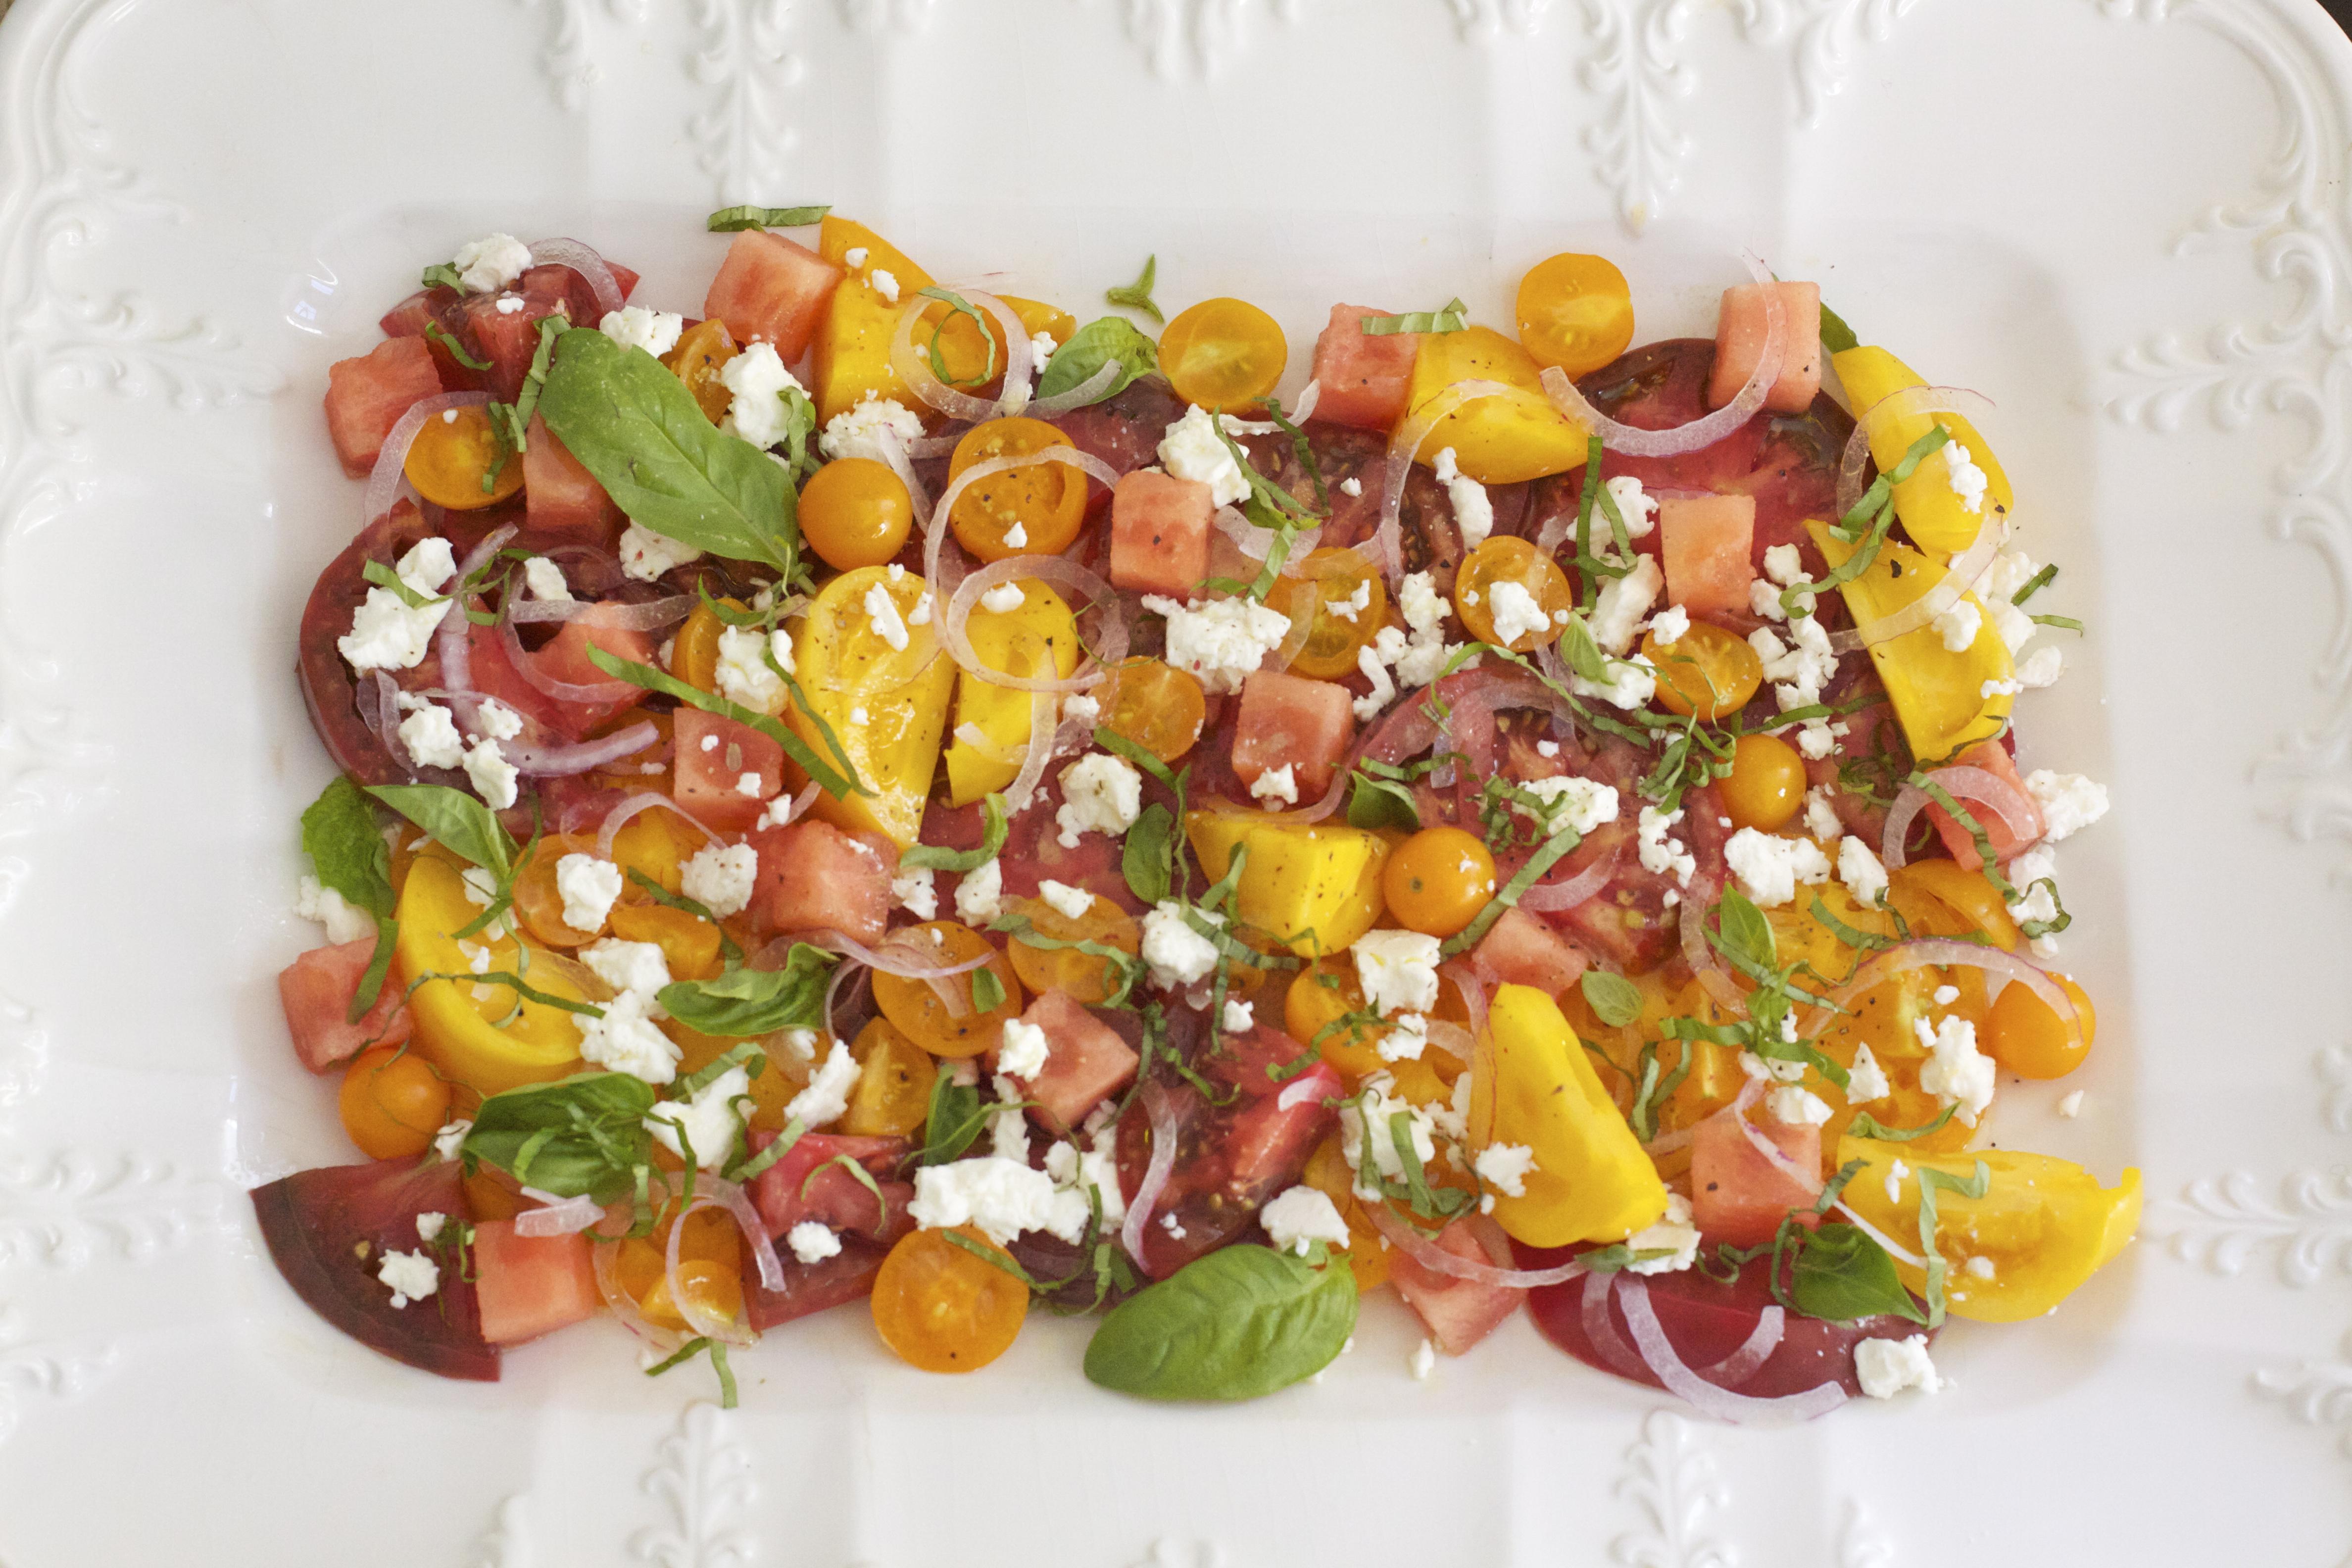 Heirloom Tomato & Watermelon Salad